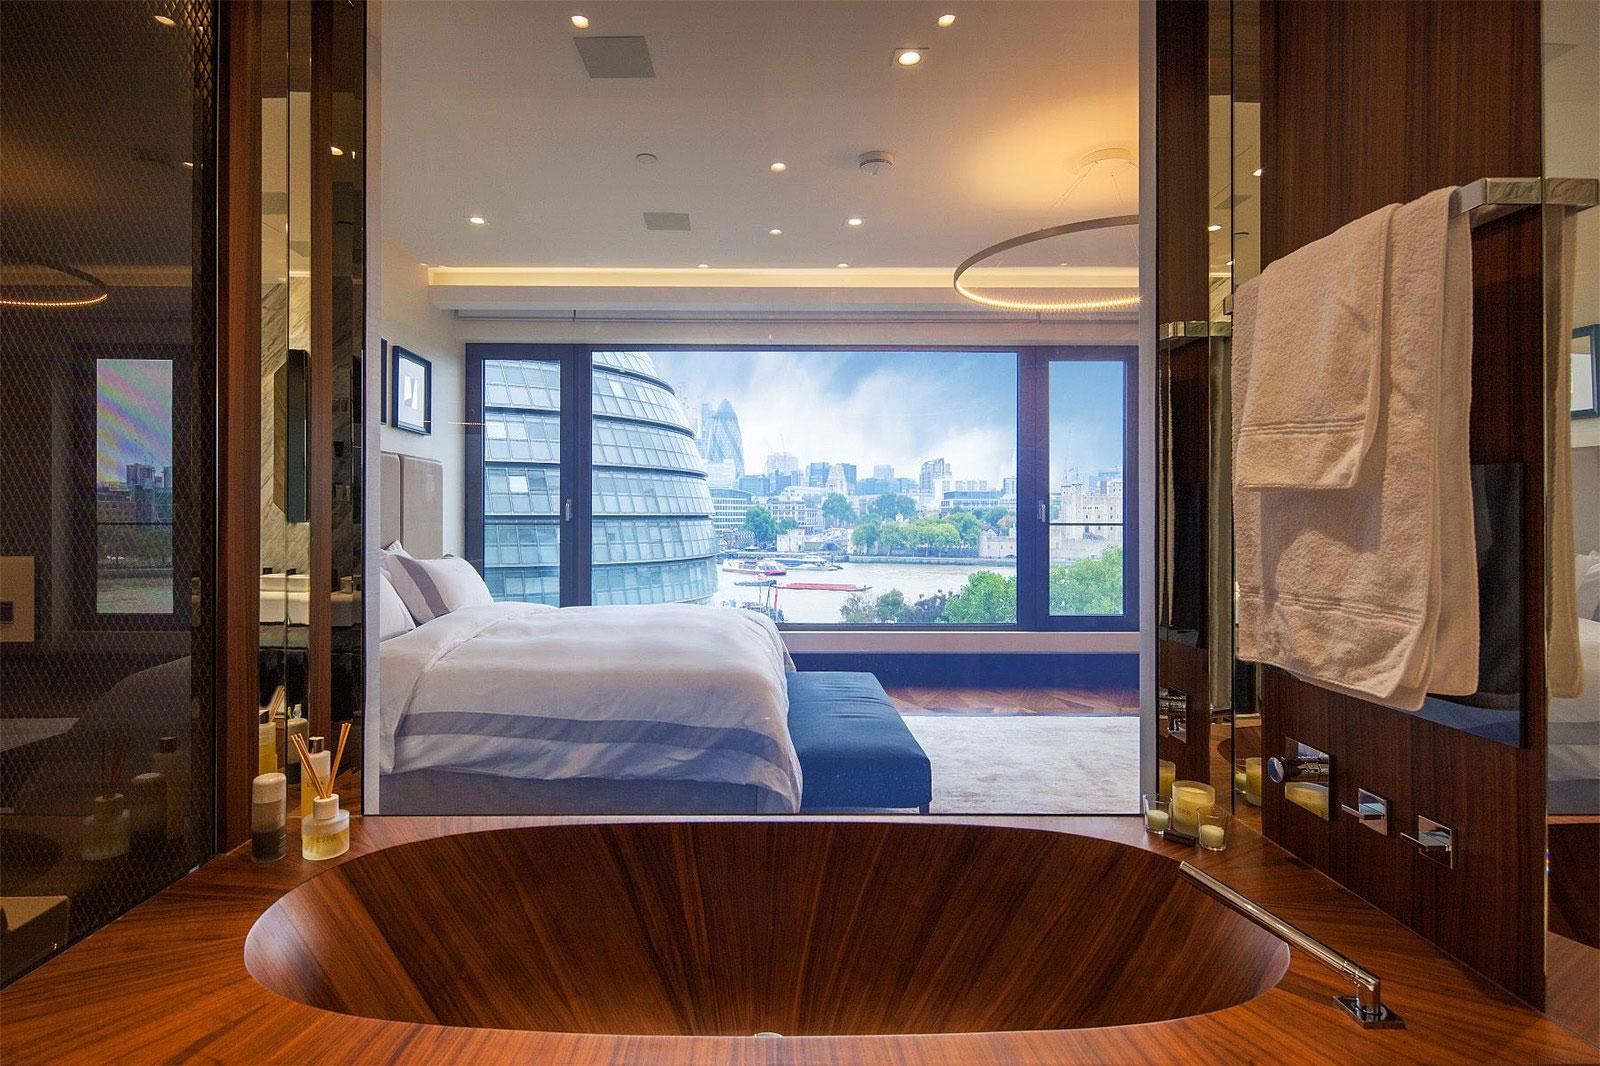 Blenheim House, One Tower Bridge, London, United Kingdom | Shereen Malik, United Kingdom Sotheby's International Realty |FINEST RESIDENCES - 7